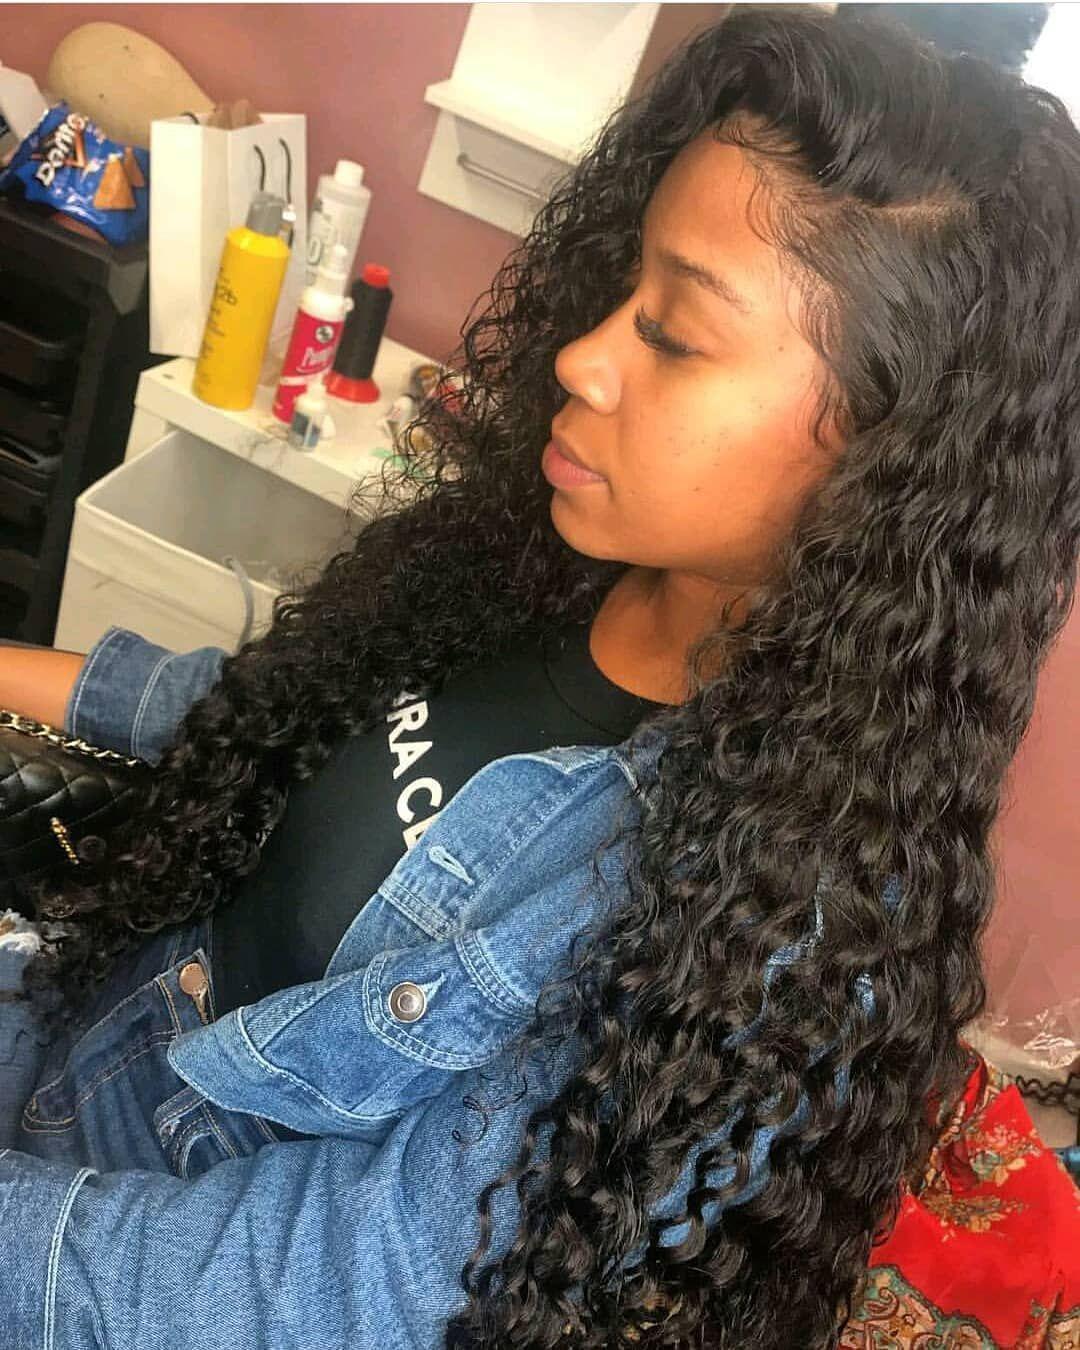 Shela Hair 3 4 Bundles With 4x4 Lace Closure Peruvian Deep Wave Human Hair Weave With Closure Deep Wave Hairstyles Sew In Hairstyles Weave Hairstyles